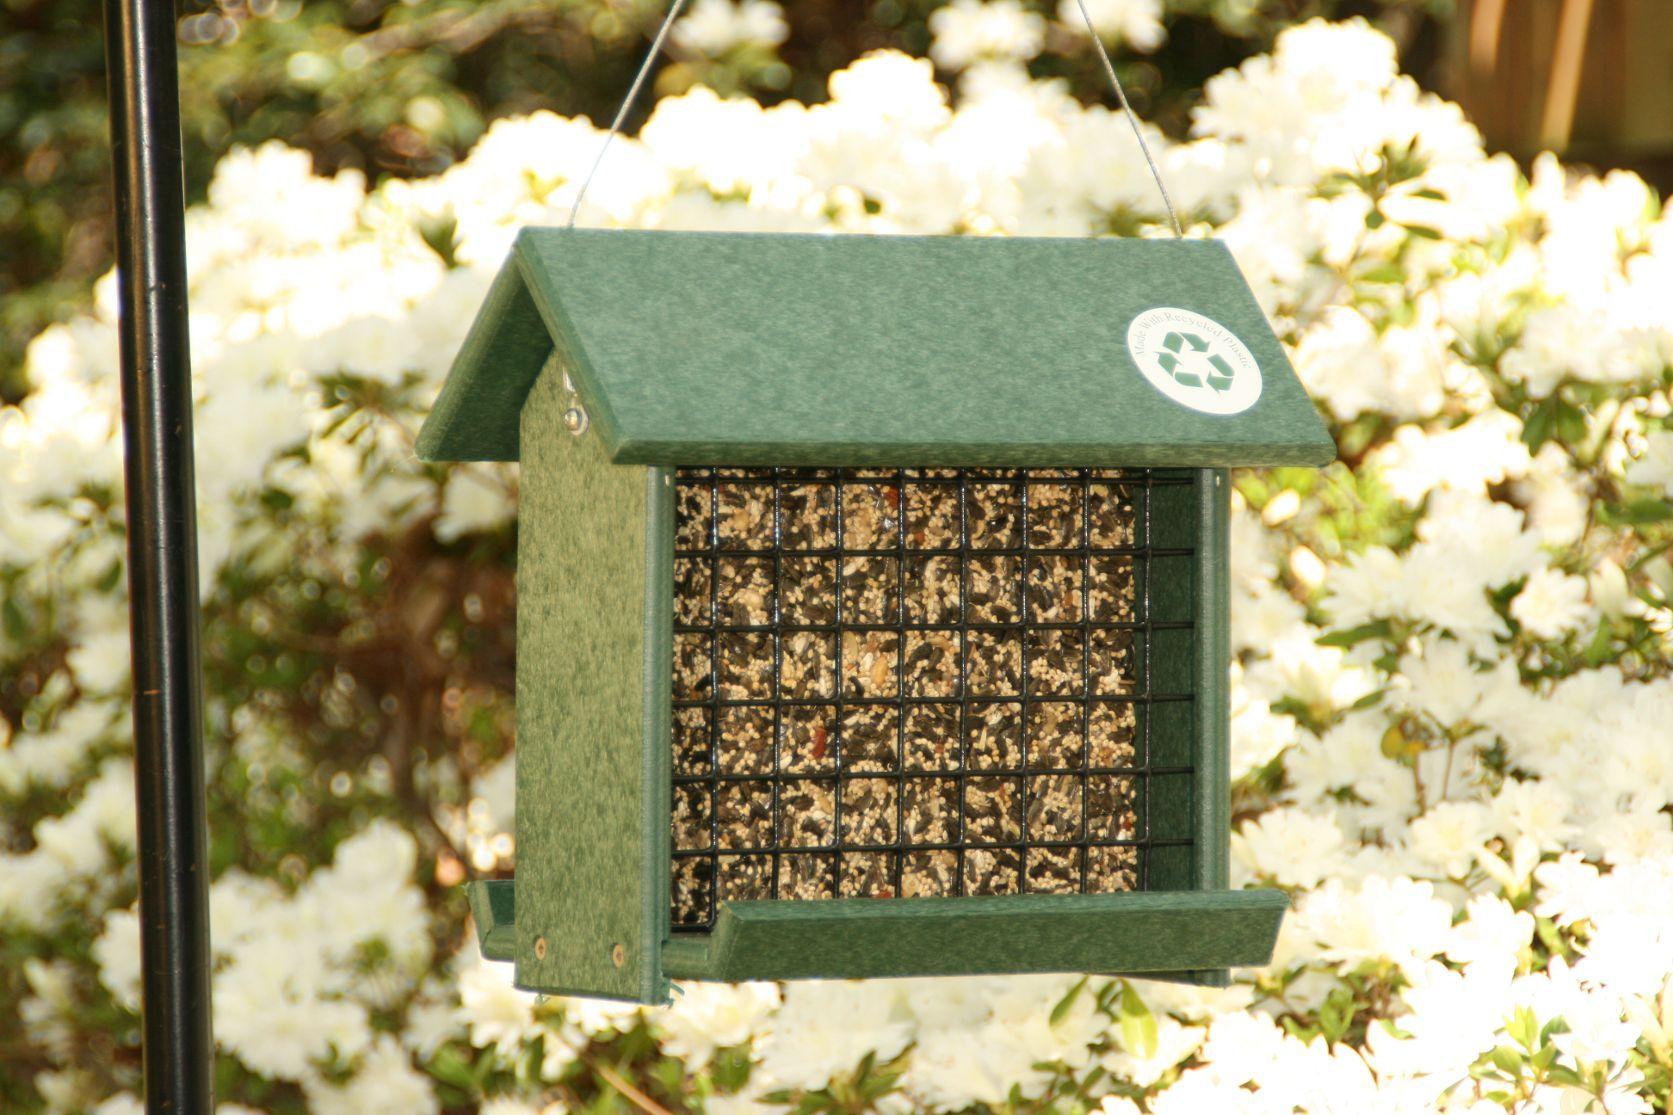 Go green woodpecker feeder holds 3 suet cakesblocks